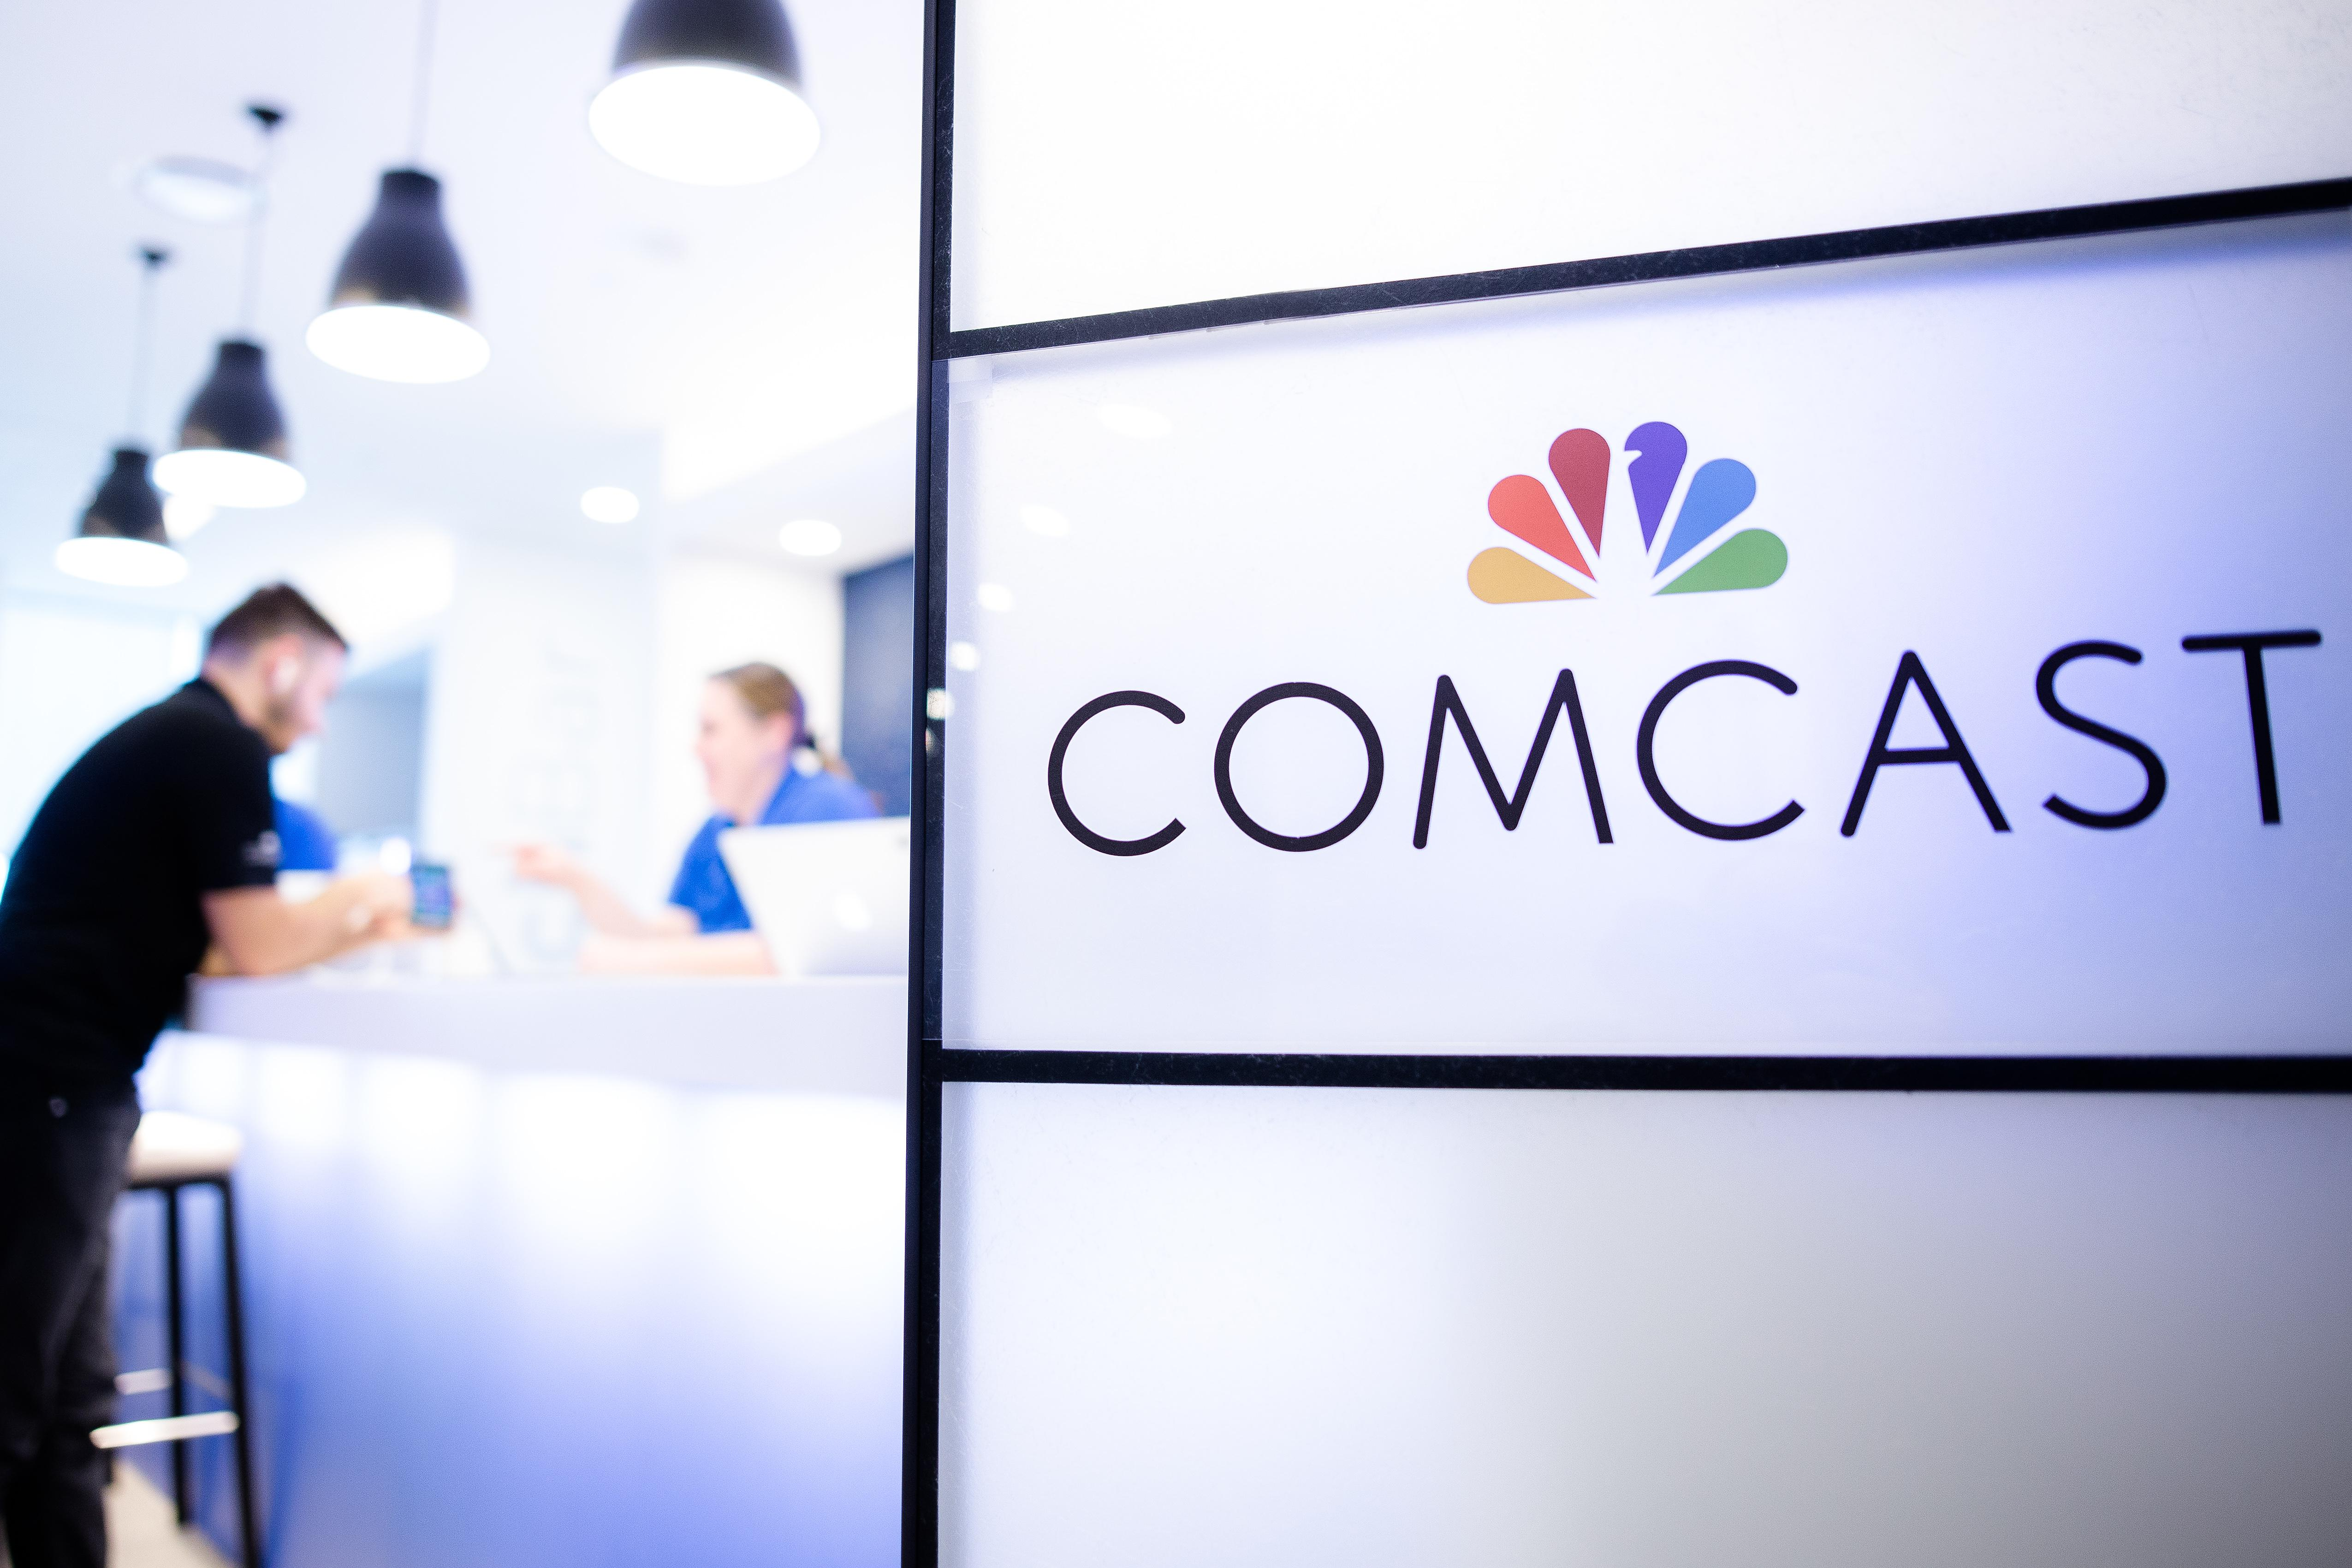 Comcast Xfinity TV app hits Spokane region, but don't toss